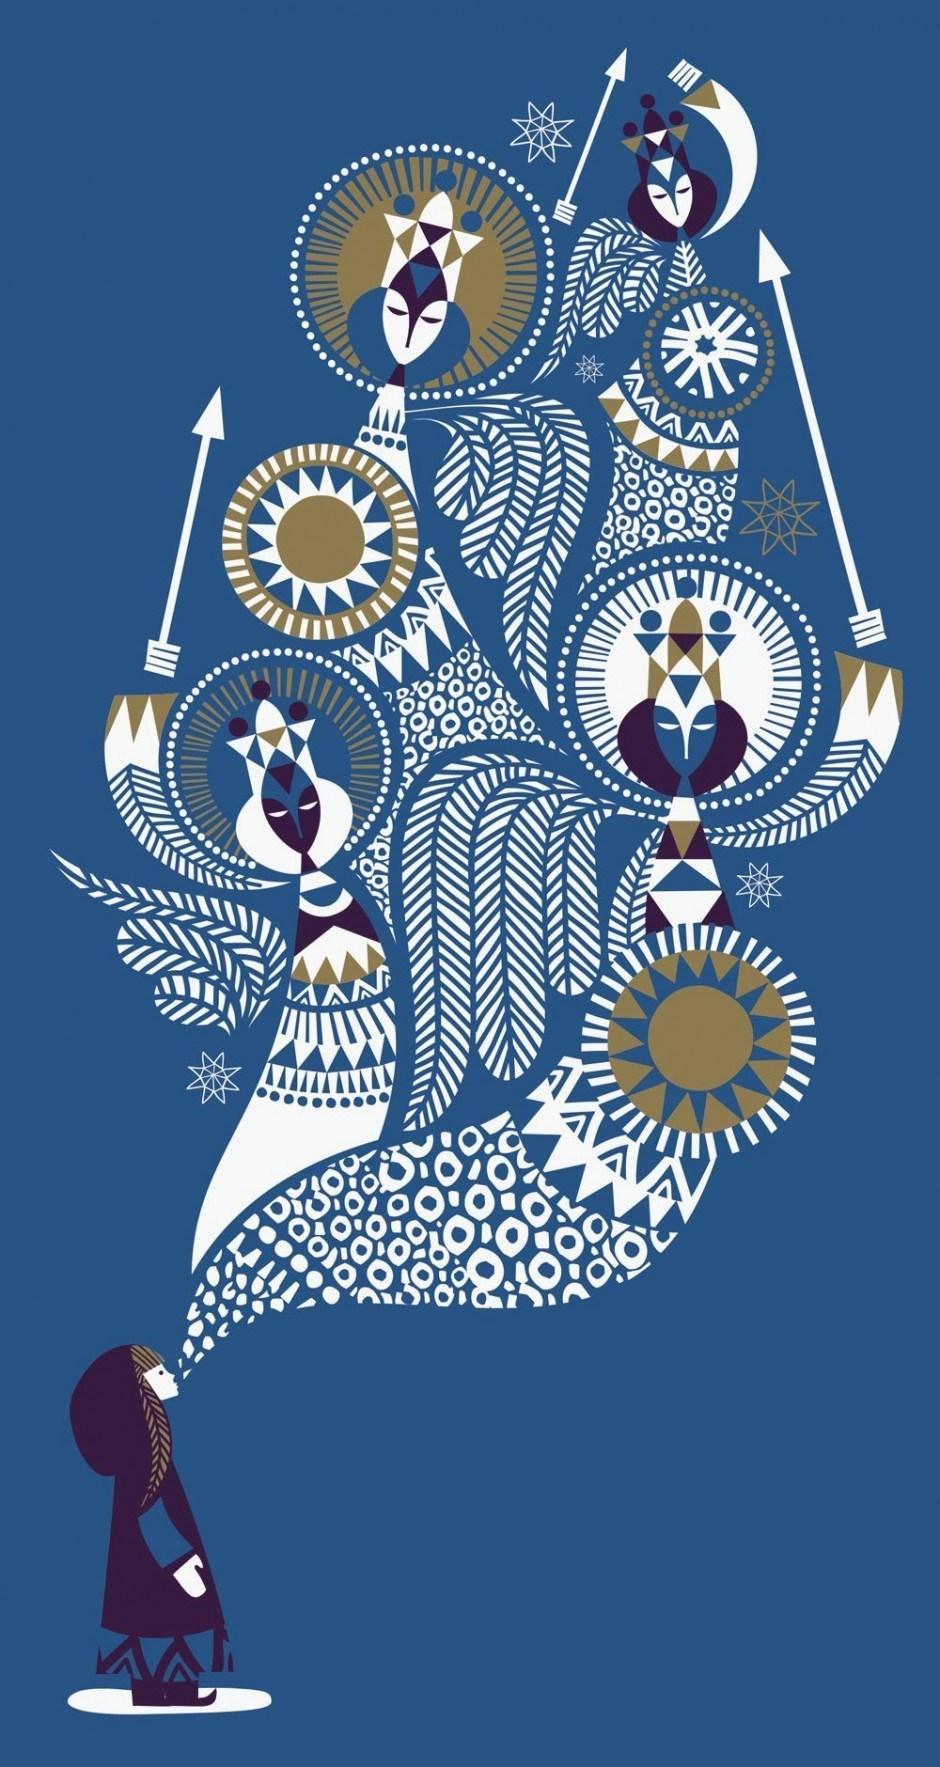 Knesebeck Verlag, 88 Seiten, 14,95 Euro, ISBN 978-3-86873-873-5